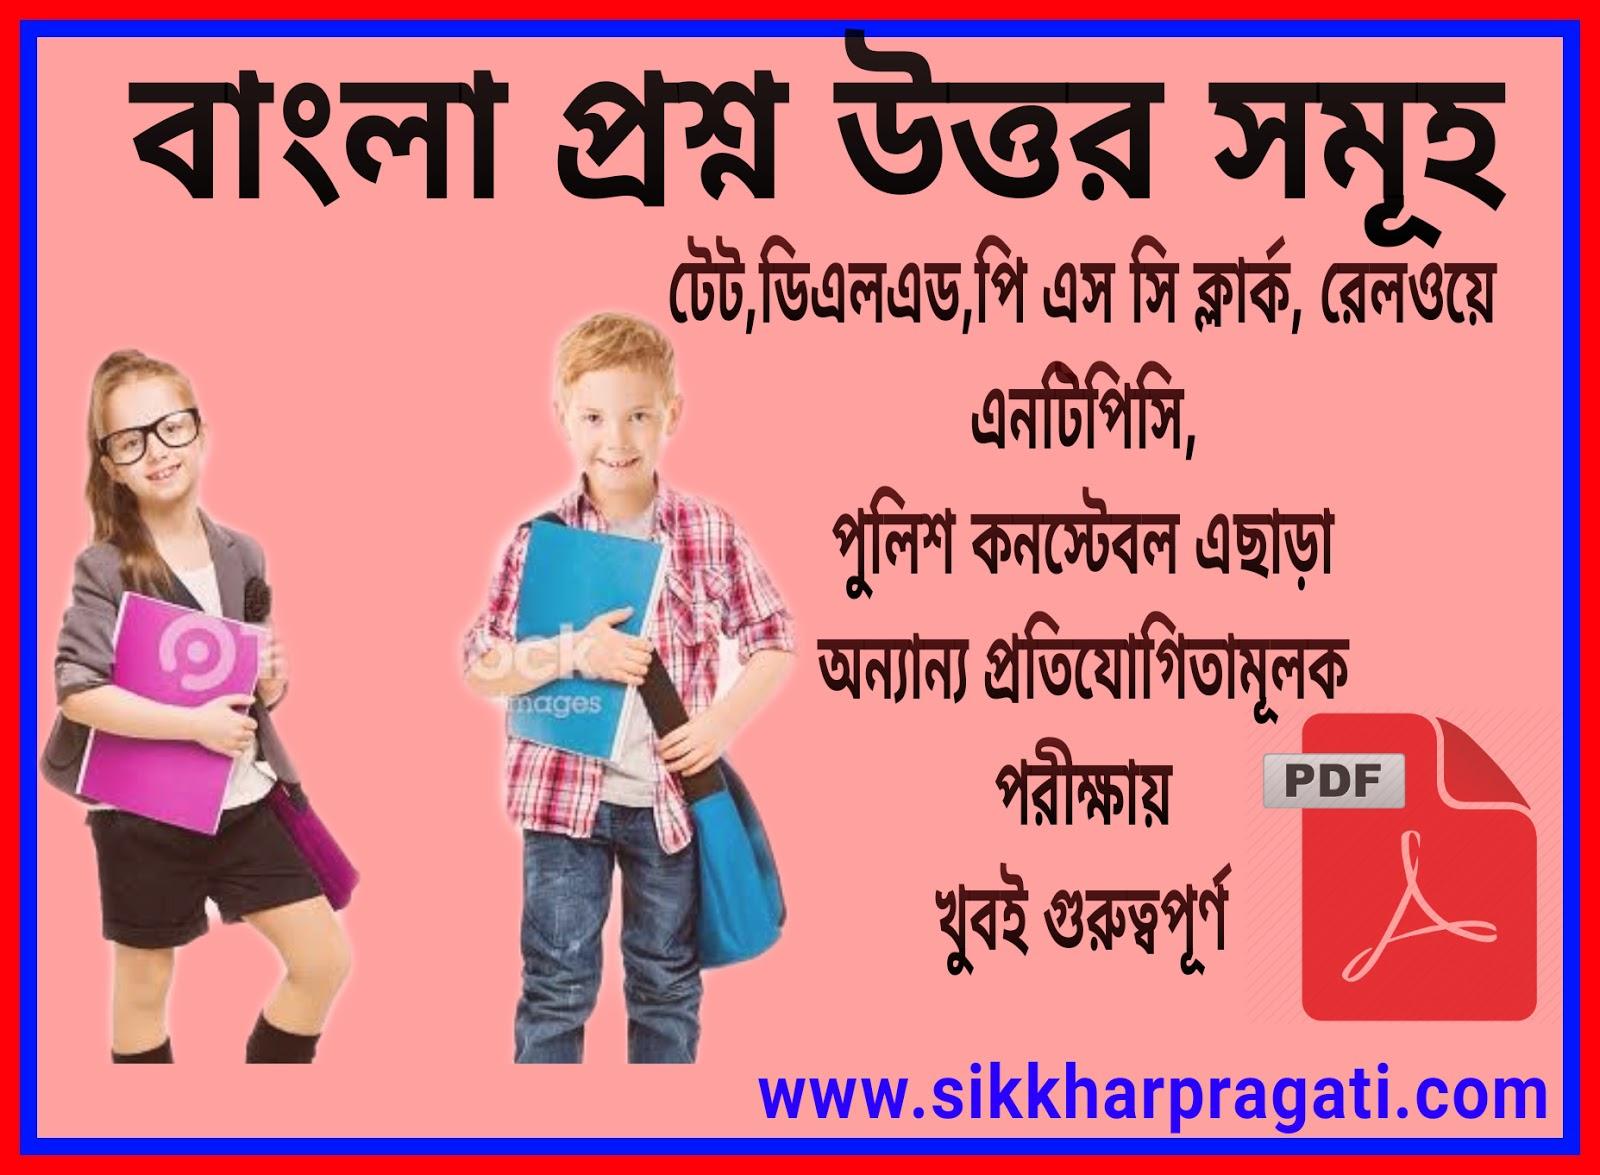 Bengali important MCQ Pdf in Bengali বাংলা গুরুত্বপূর্ণ প্রশ্ন উত্তর